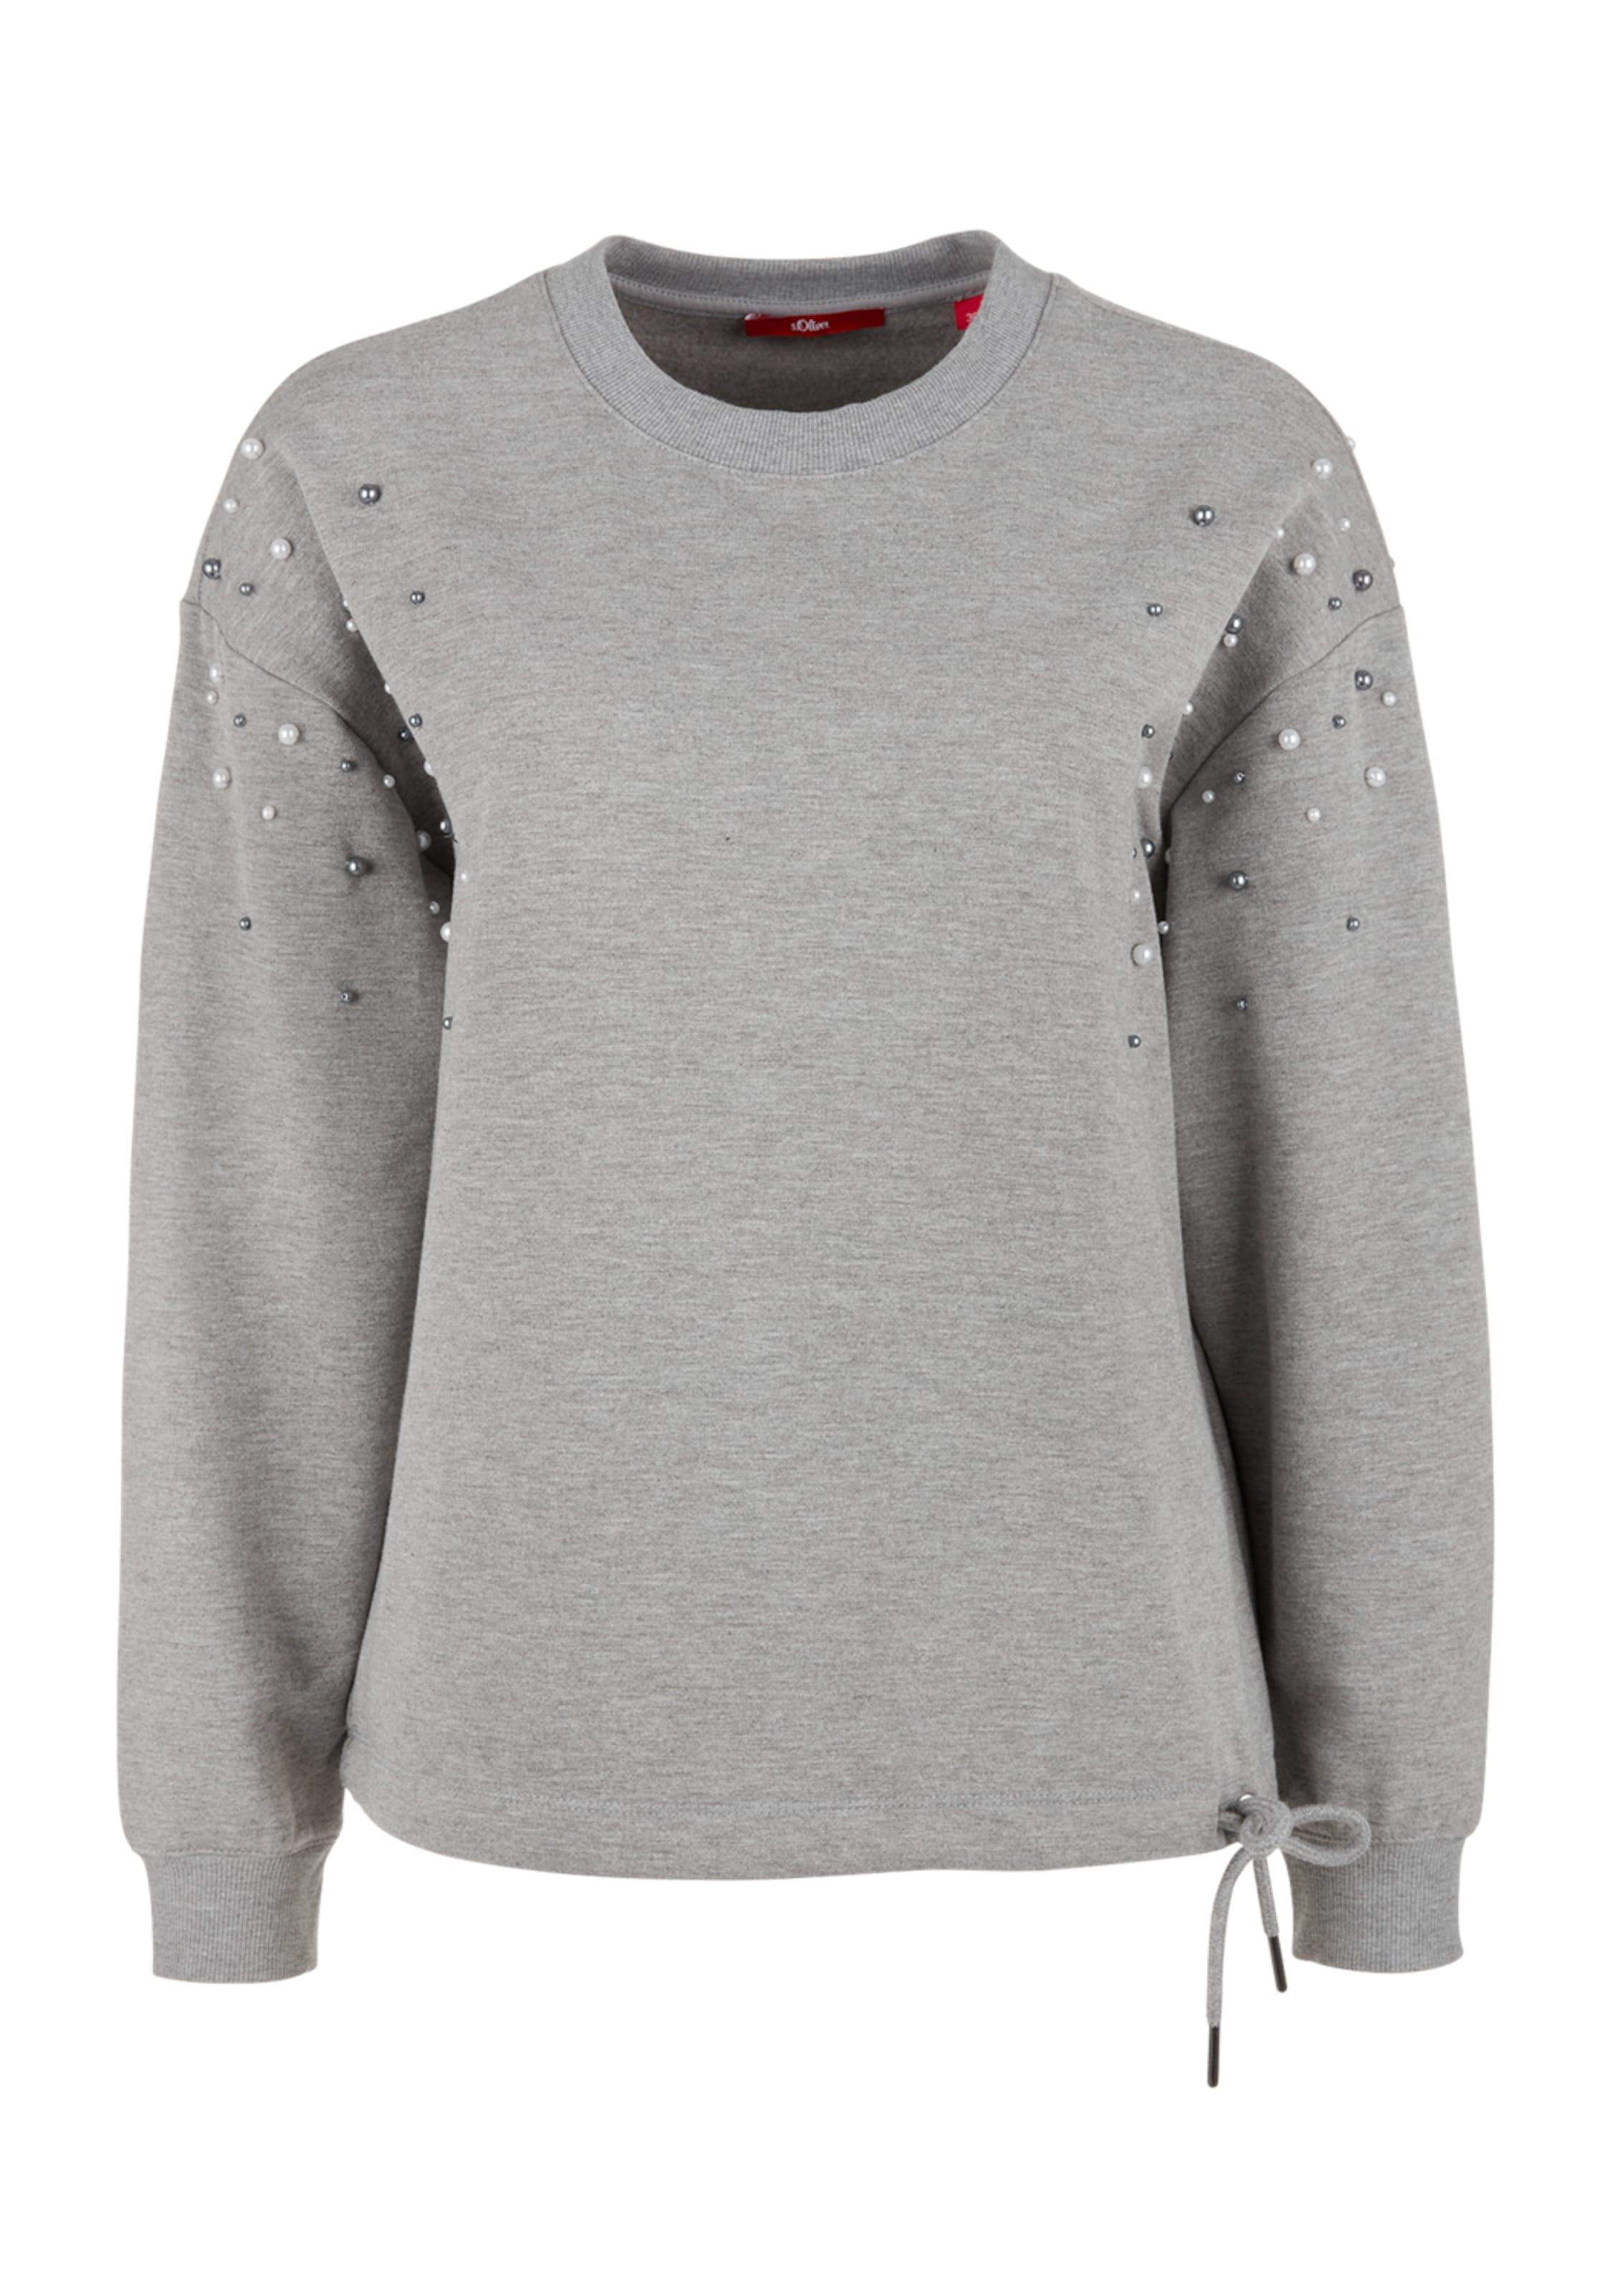 Grau S oliver Sweatshirt oliver S In hQxsCrtd